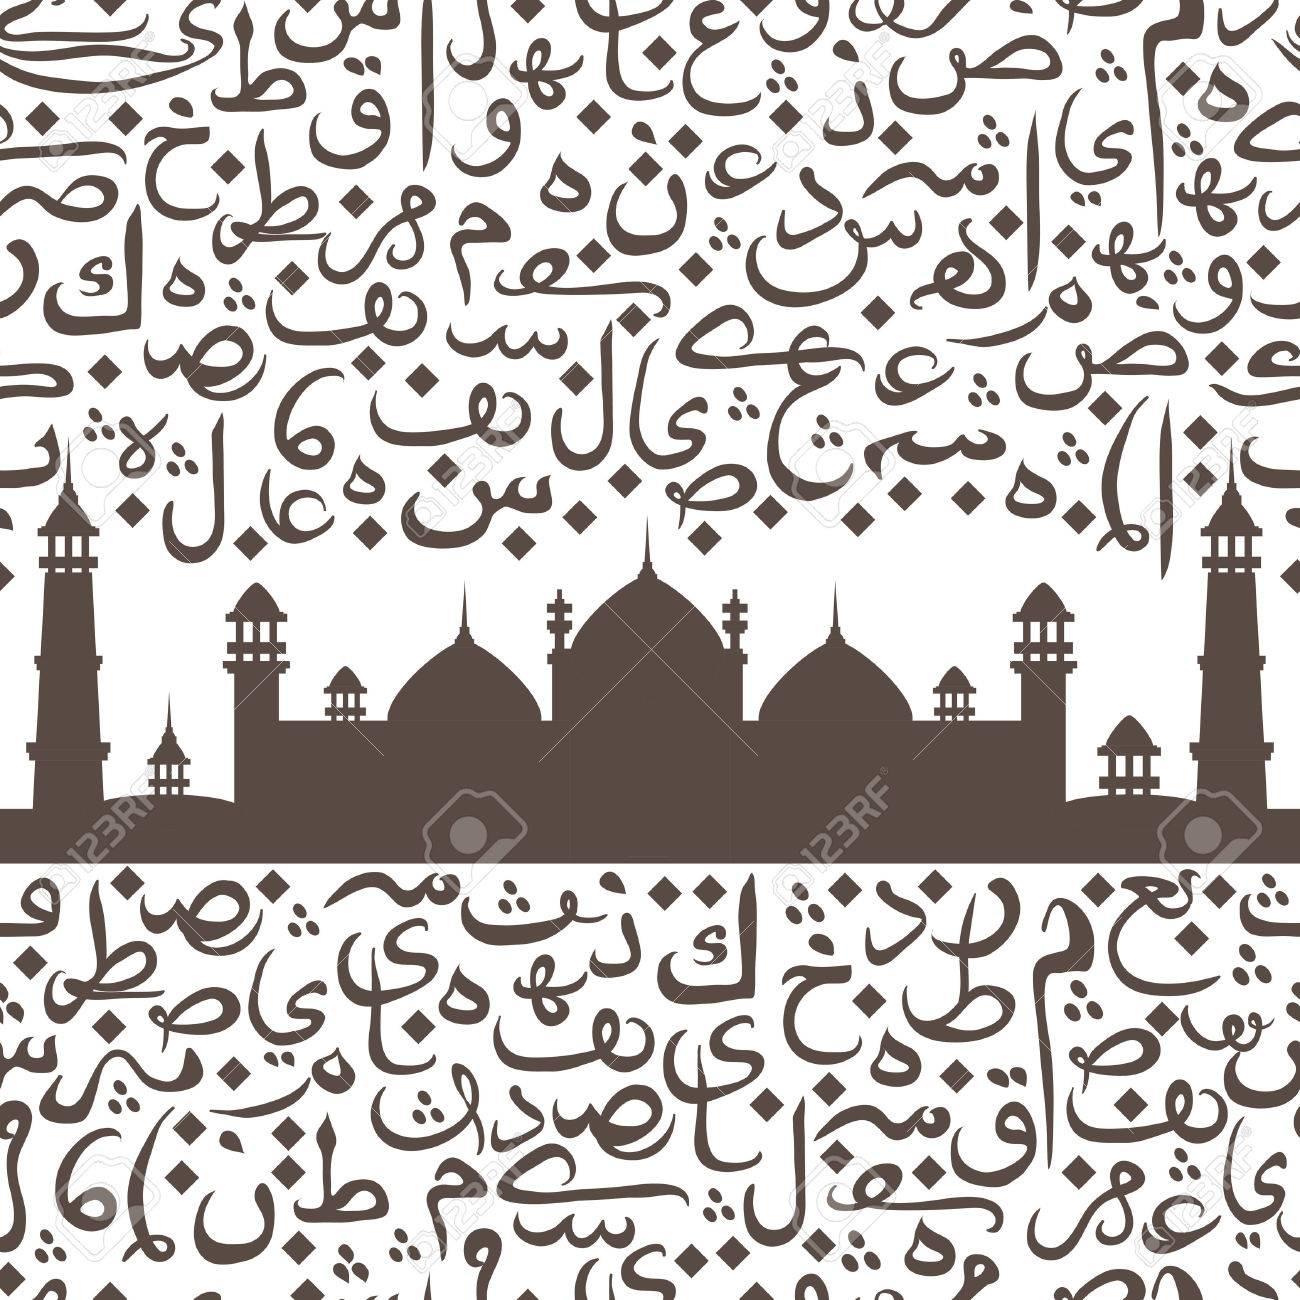 seamless pattern ornament Arabic calligraphy of text Eid Mubarak and mosque. Concept for muslim community festival Eid Al FitrEid Mubarak - 43922106